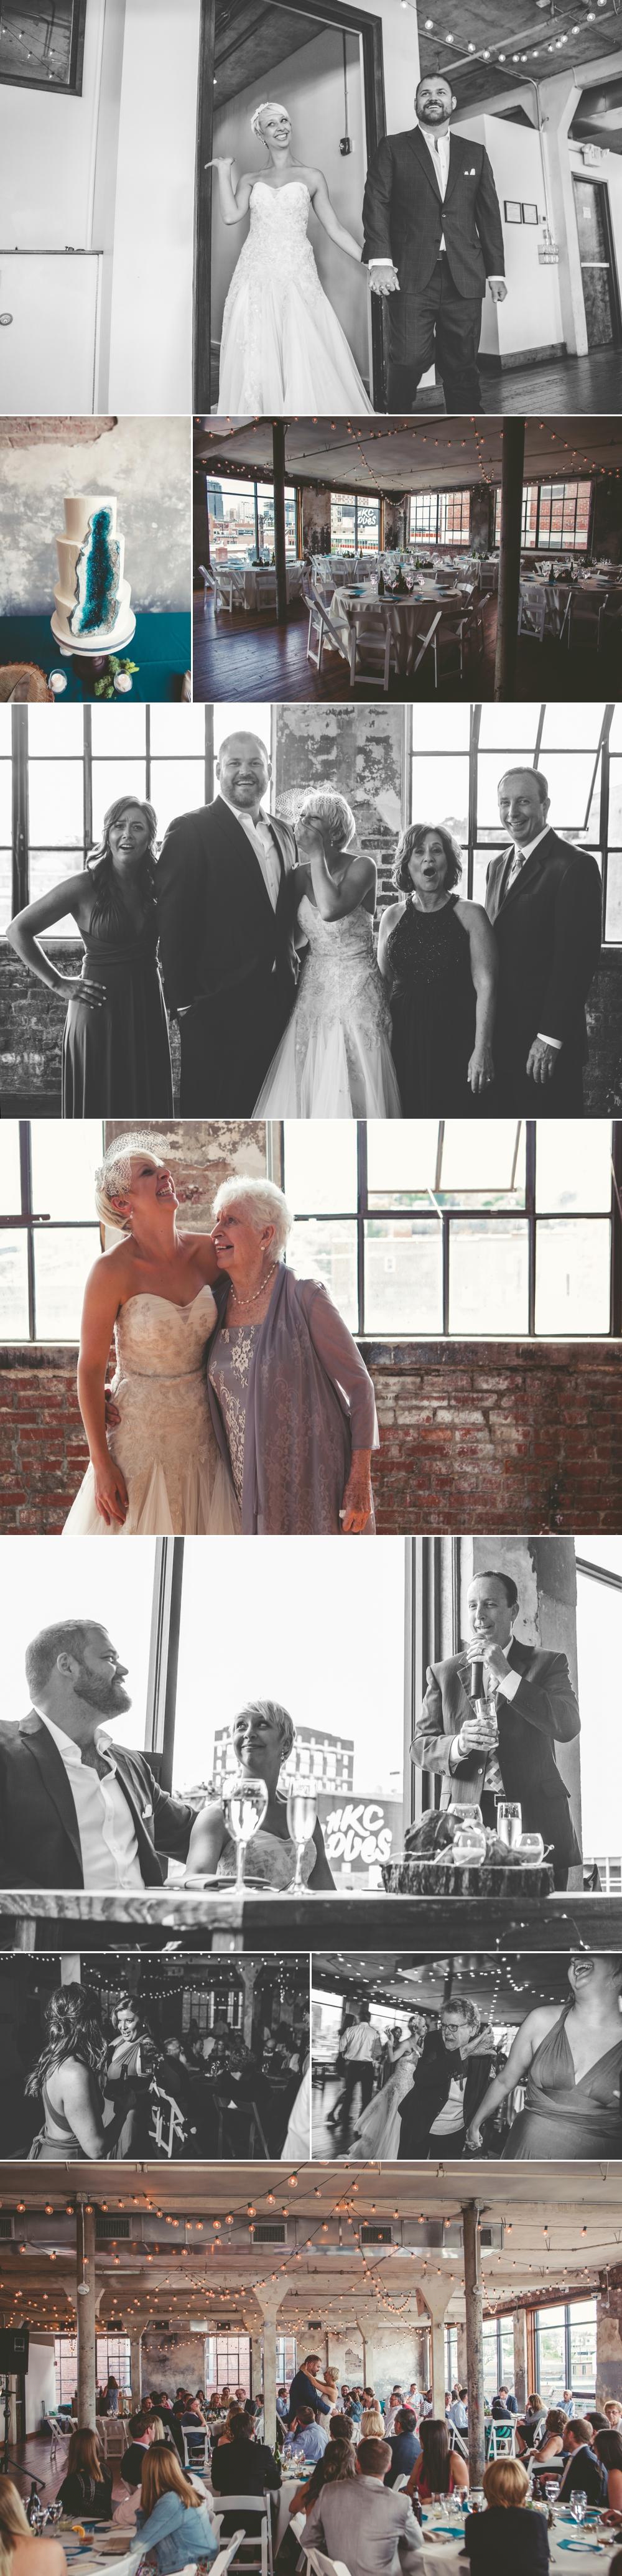 jason_domingues_photography_best_kansas_city_photographer_kc_weddings_toms_town_bauer_0003